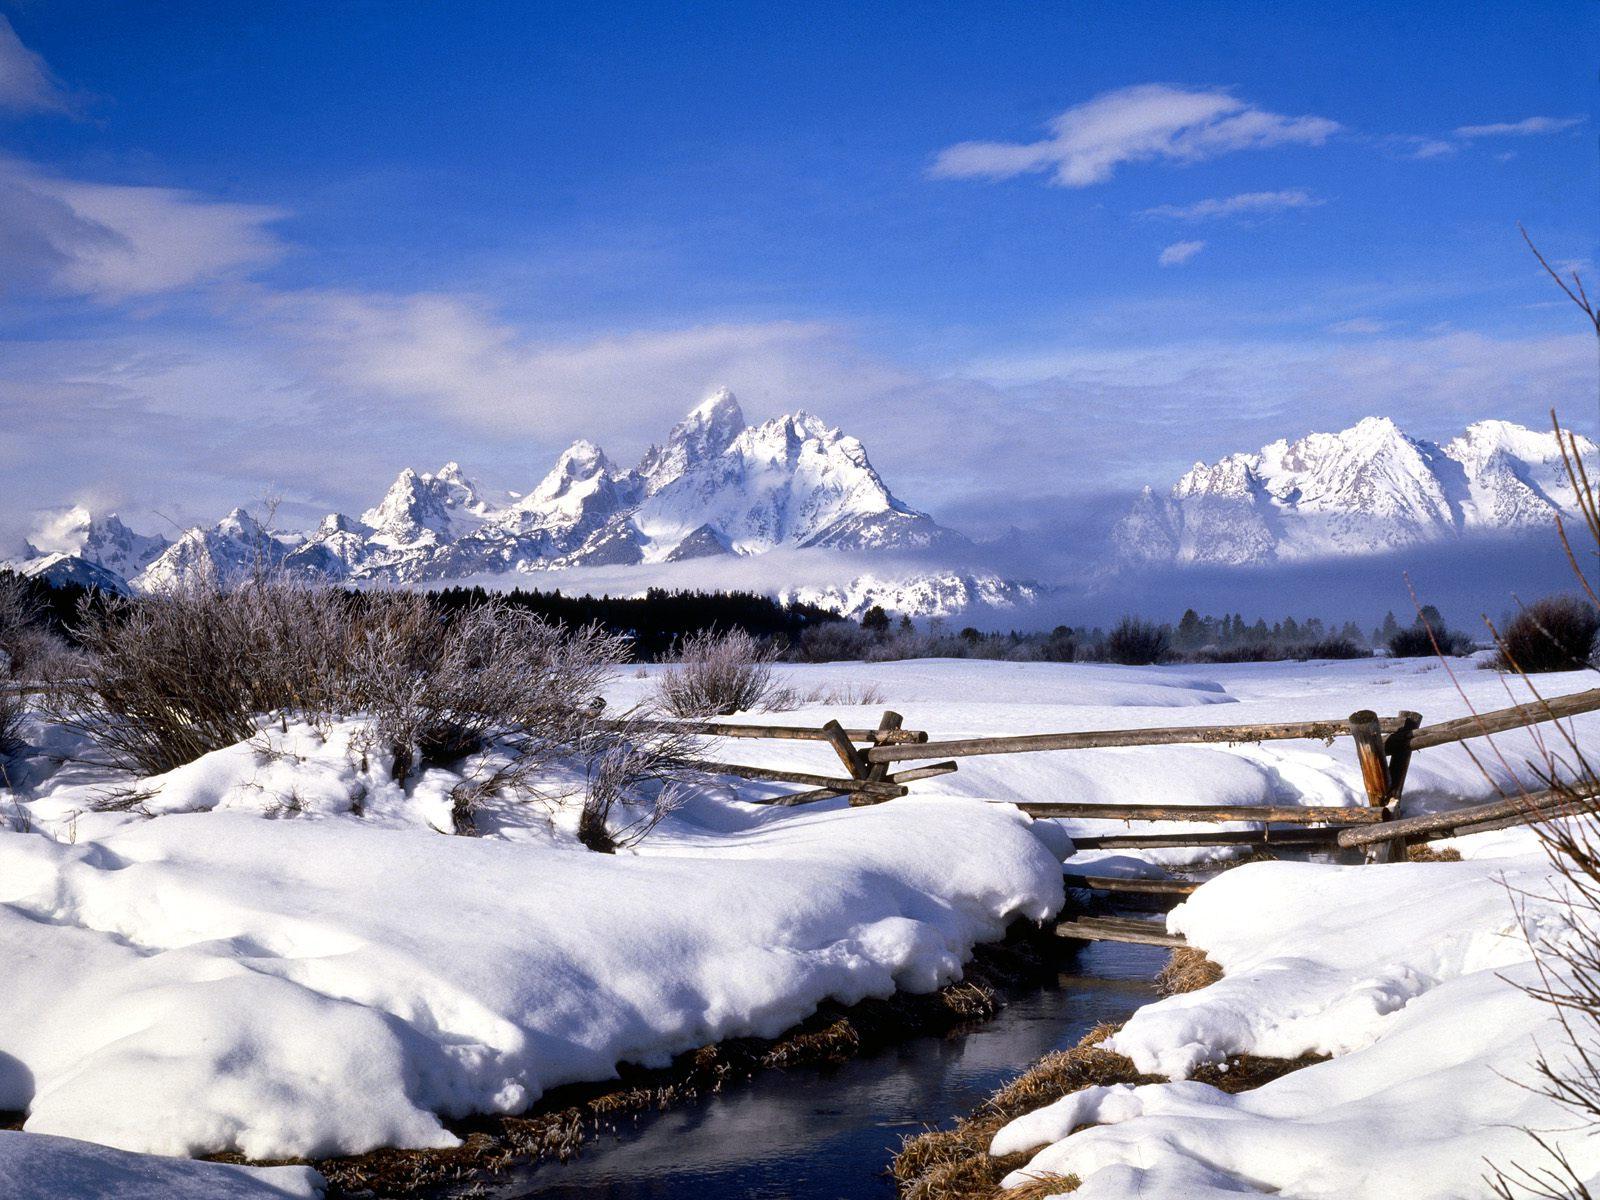 http://2.bp.blogspot.com/-aJCwyUPWpVQ/TsEm0oJQp5I/AAAAAAAAAsI/HqxN8NWkKy4/s1600/snow-wallpapers-desktop-7.jpg